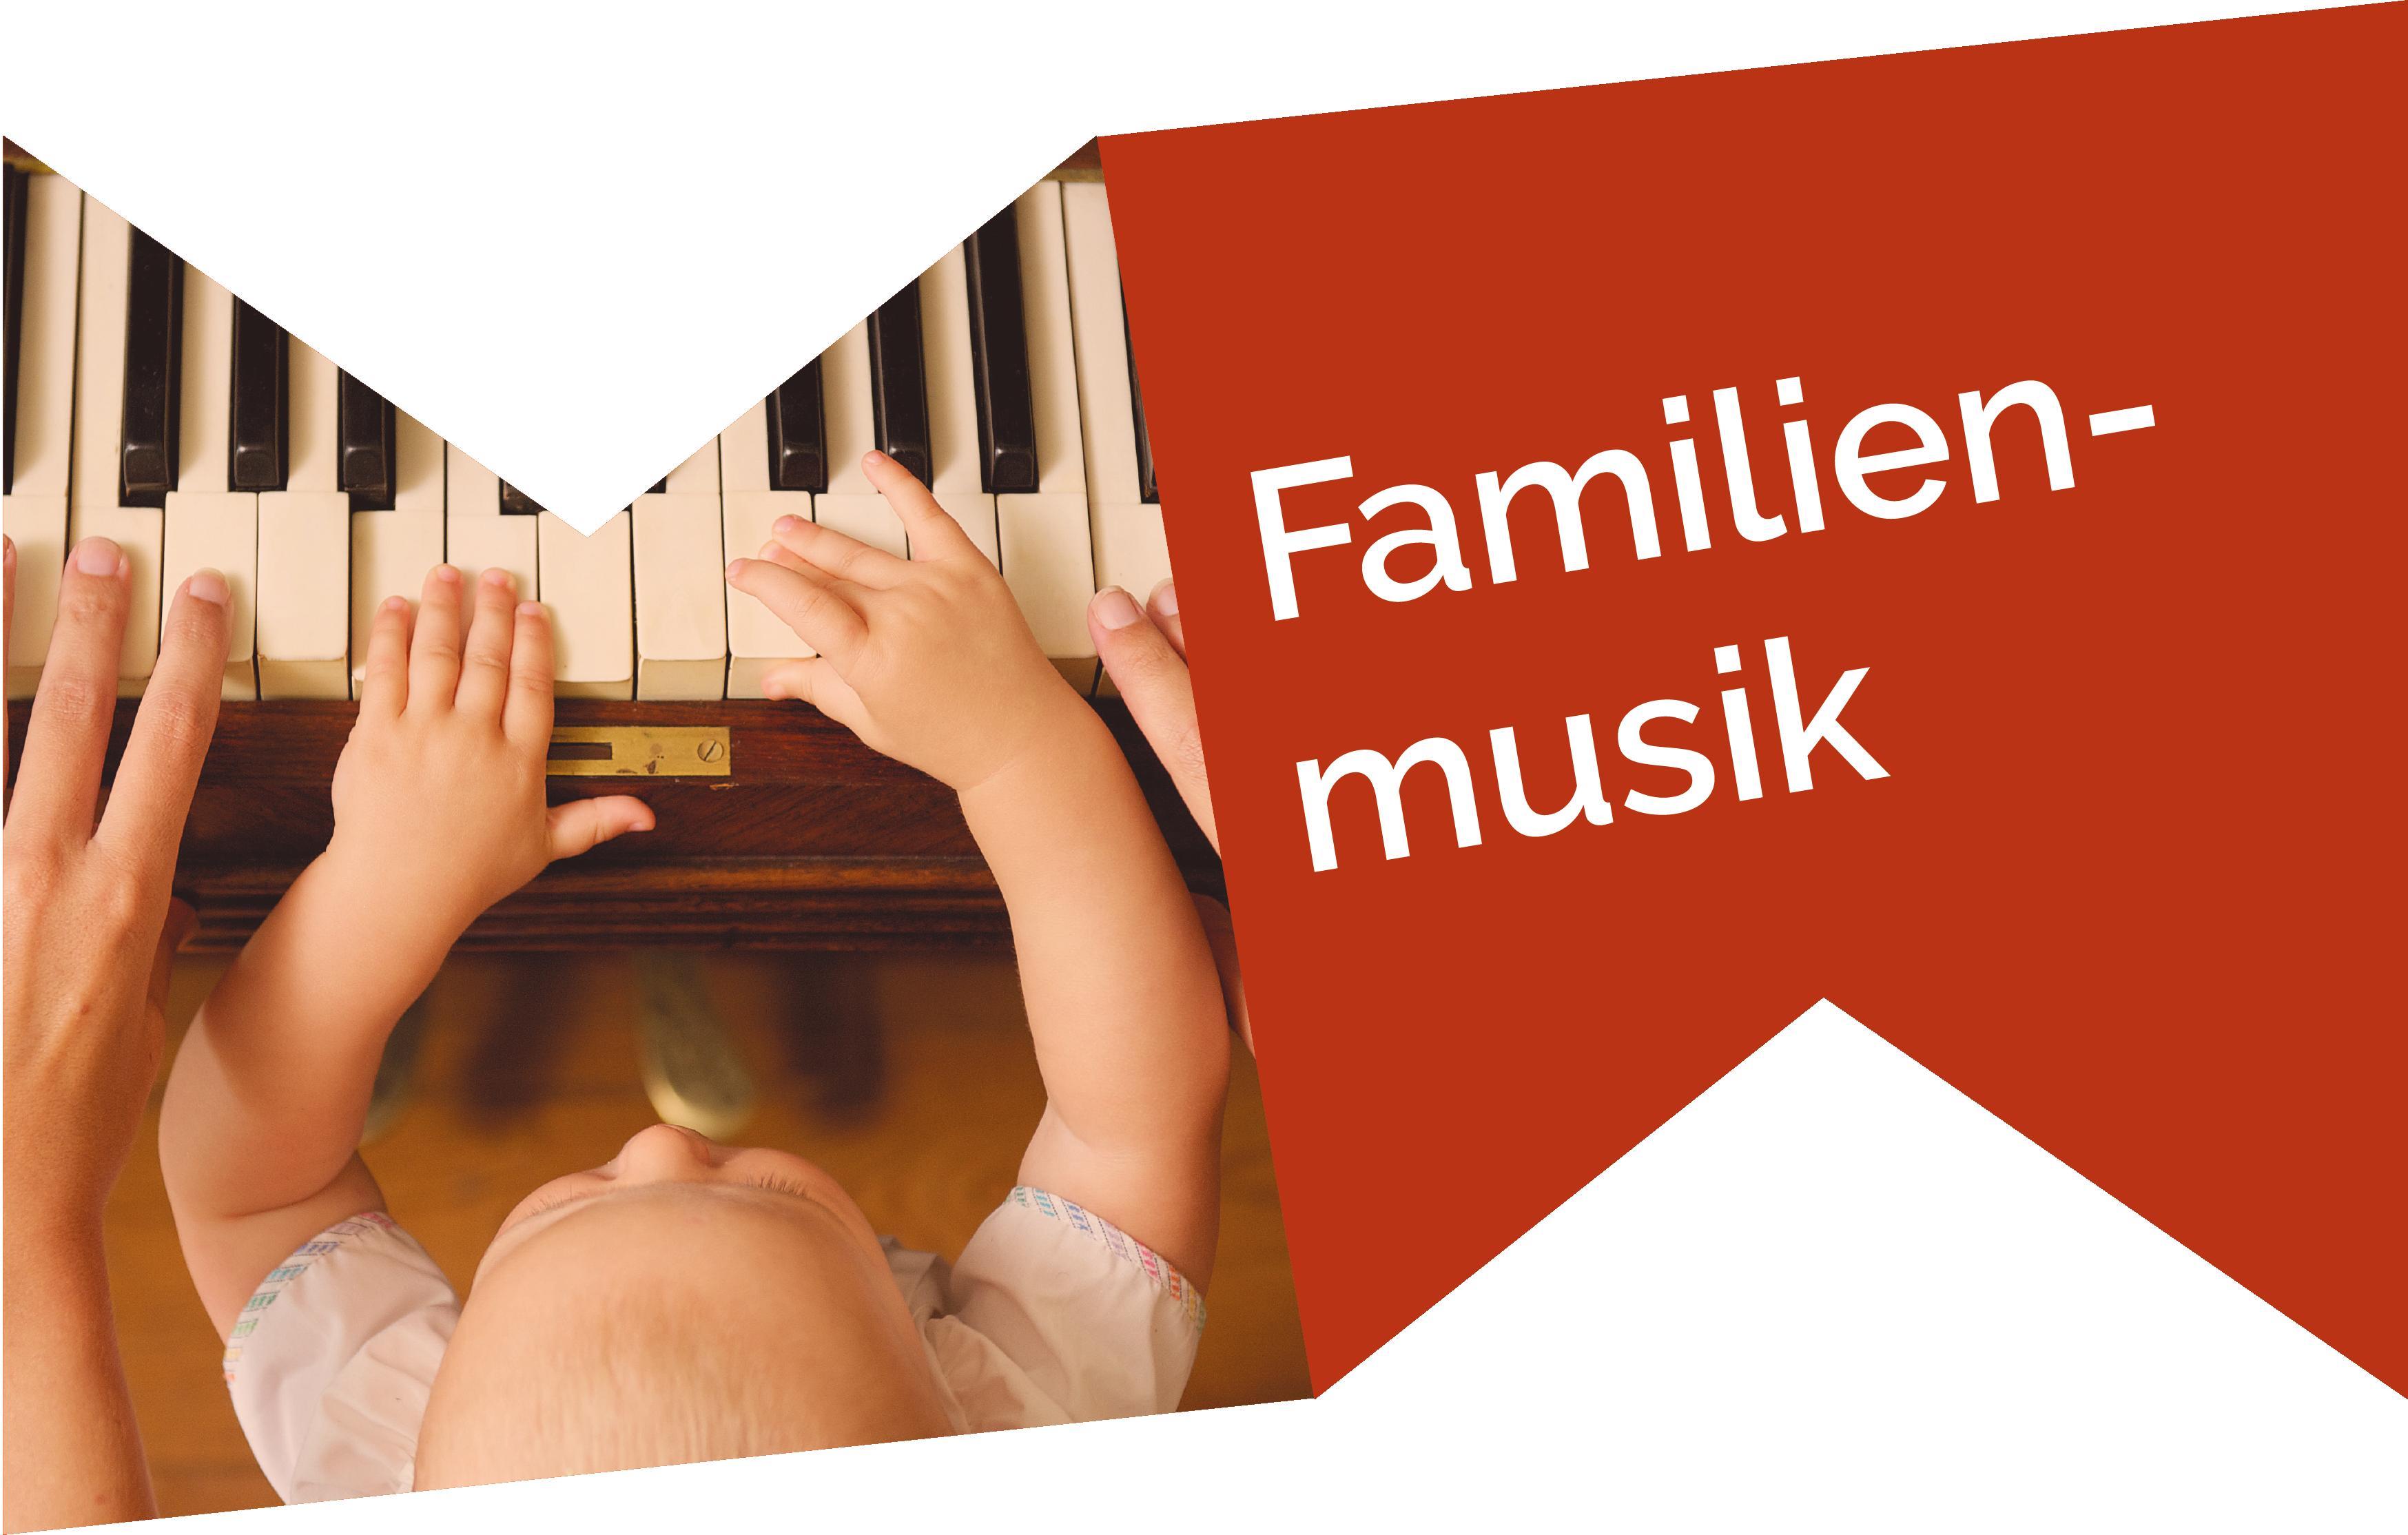 Familienmusik am Nachmittag montags